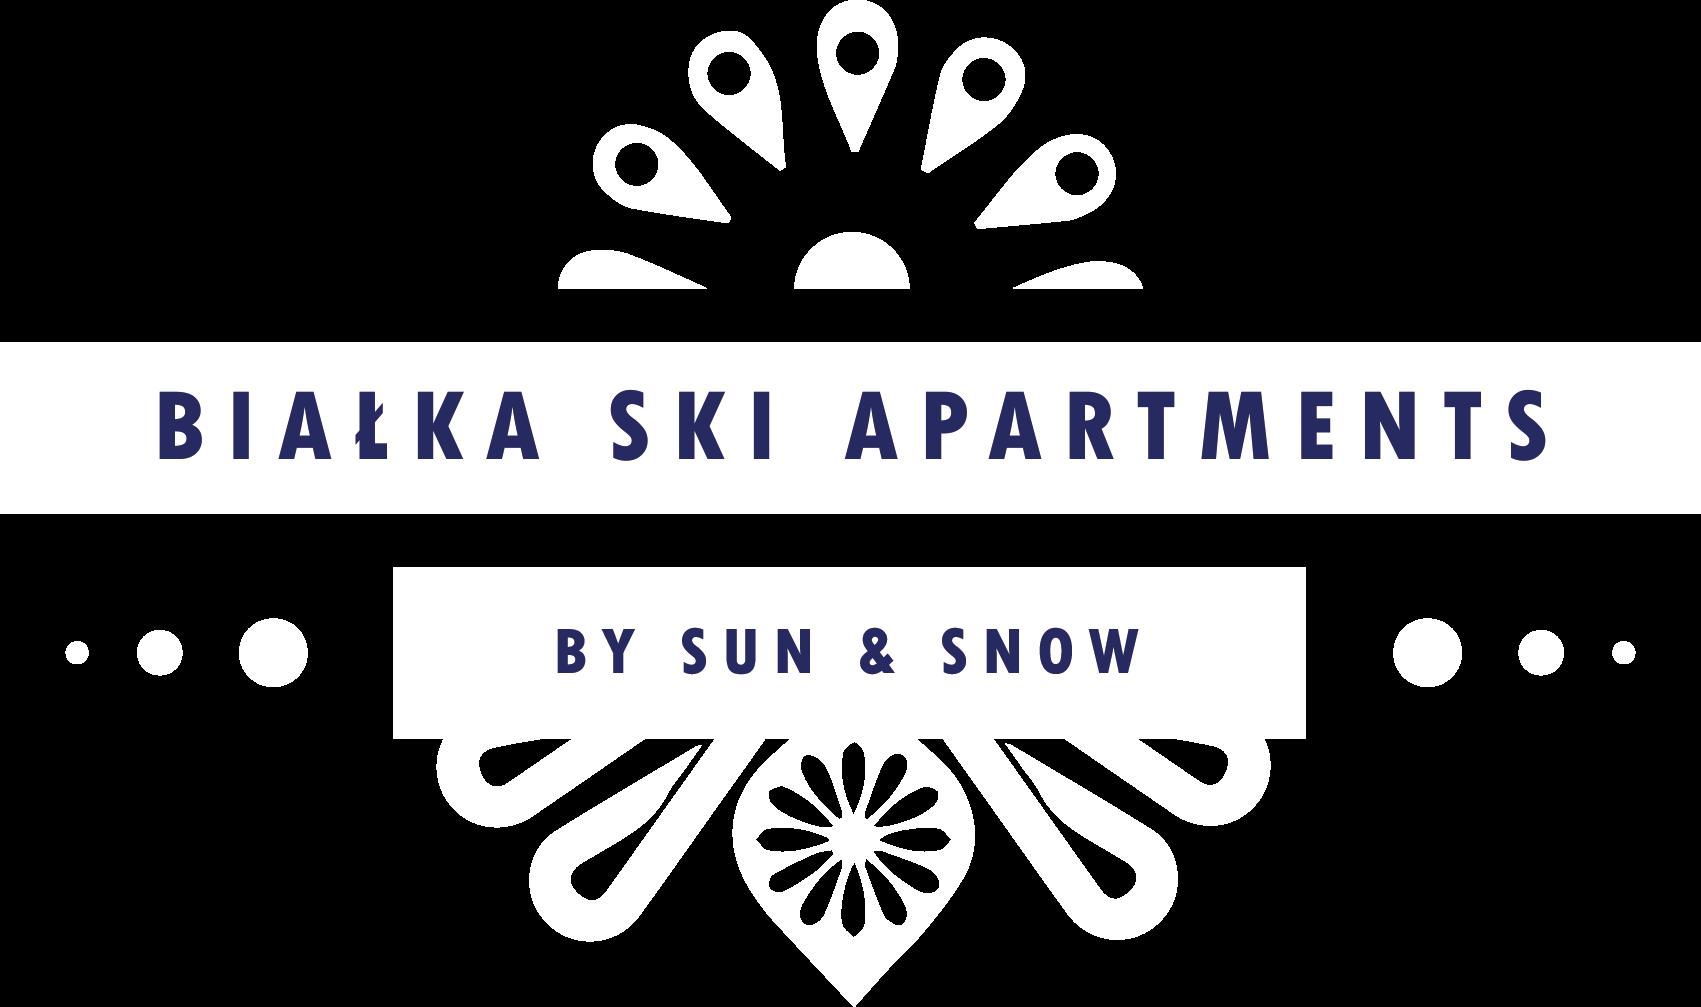 Białka SKI Apartments logo